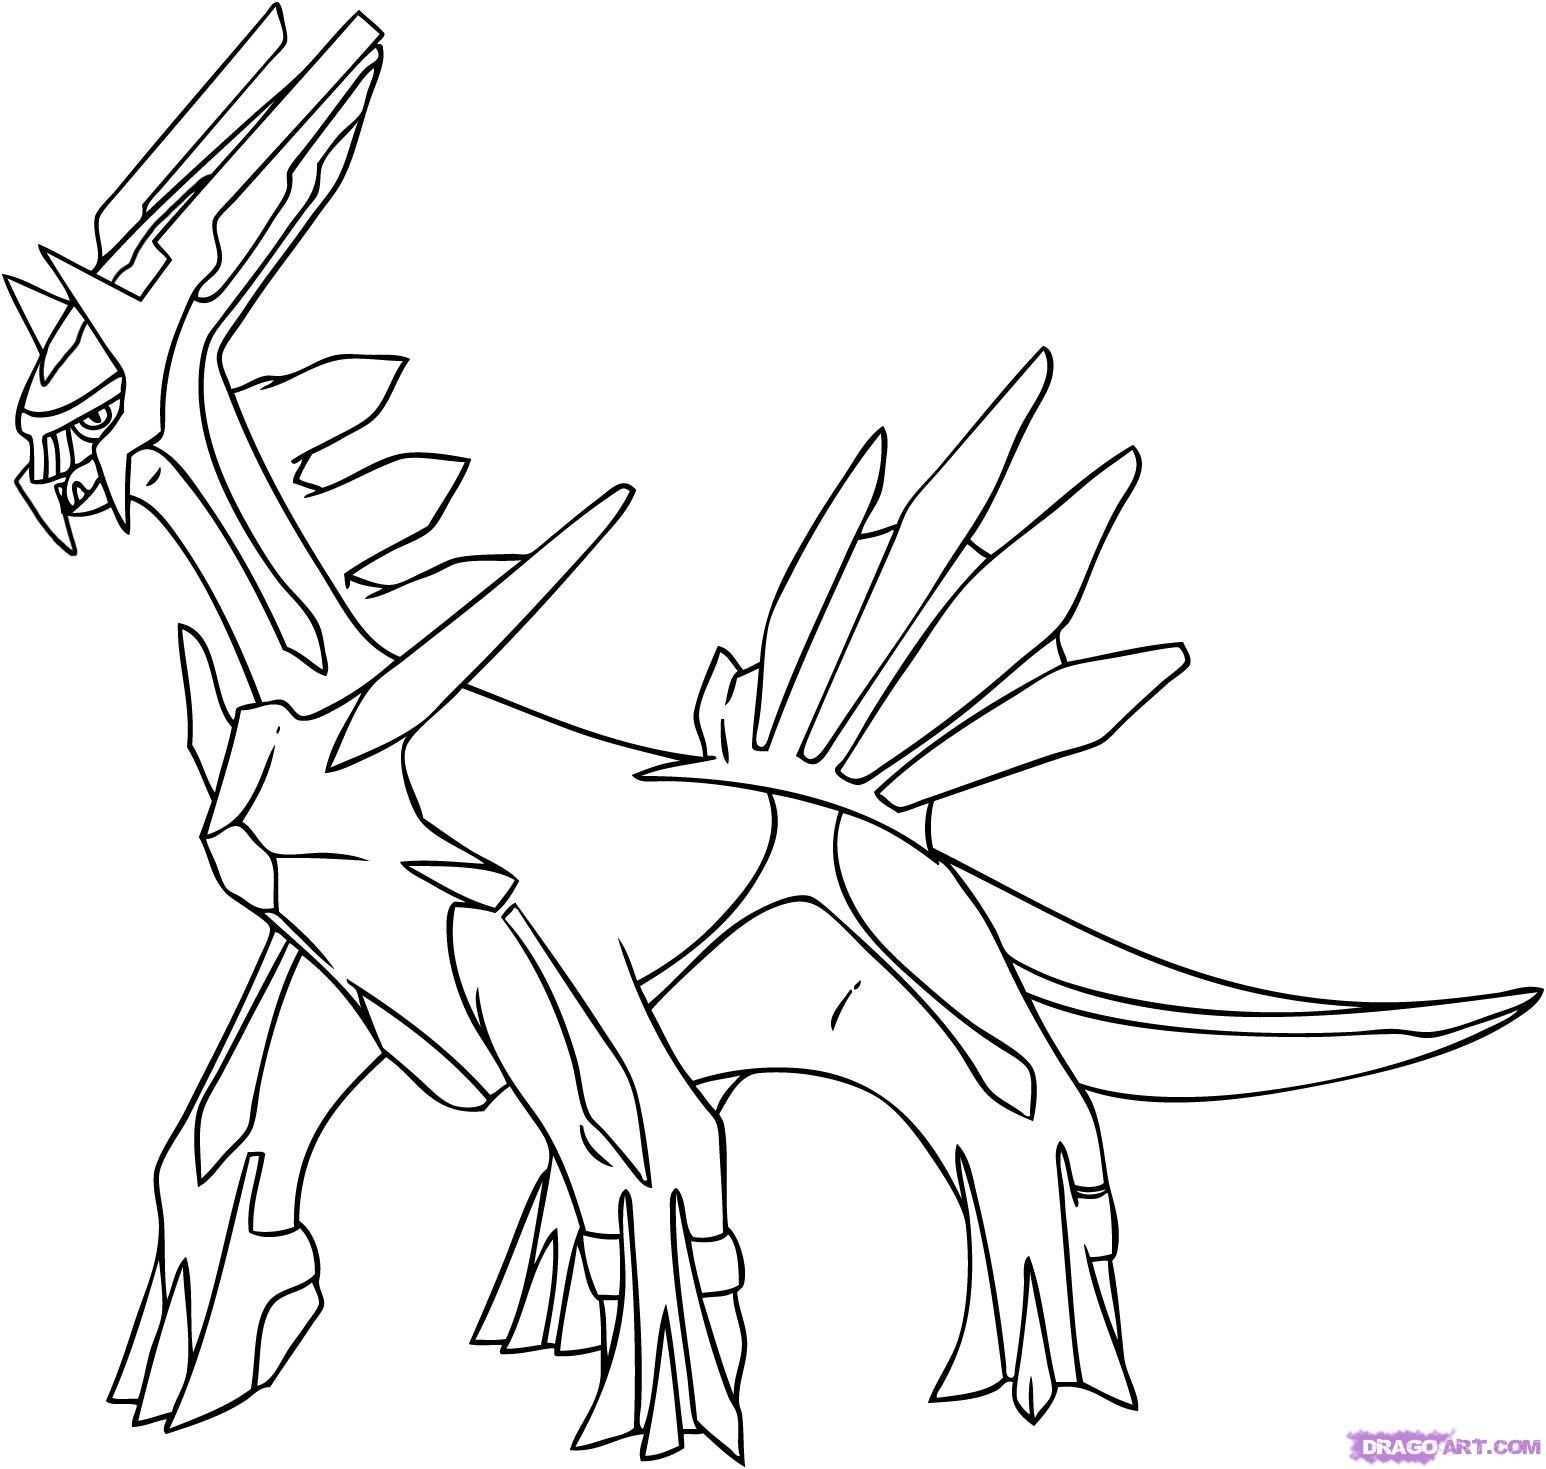 How To Draw Dialga Step 7 1 000000012880 5 Jpg 1546 1469 Pokemon Coloring Pokemon Coloring Pages Dragon Coloring Page